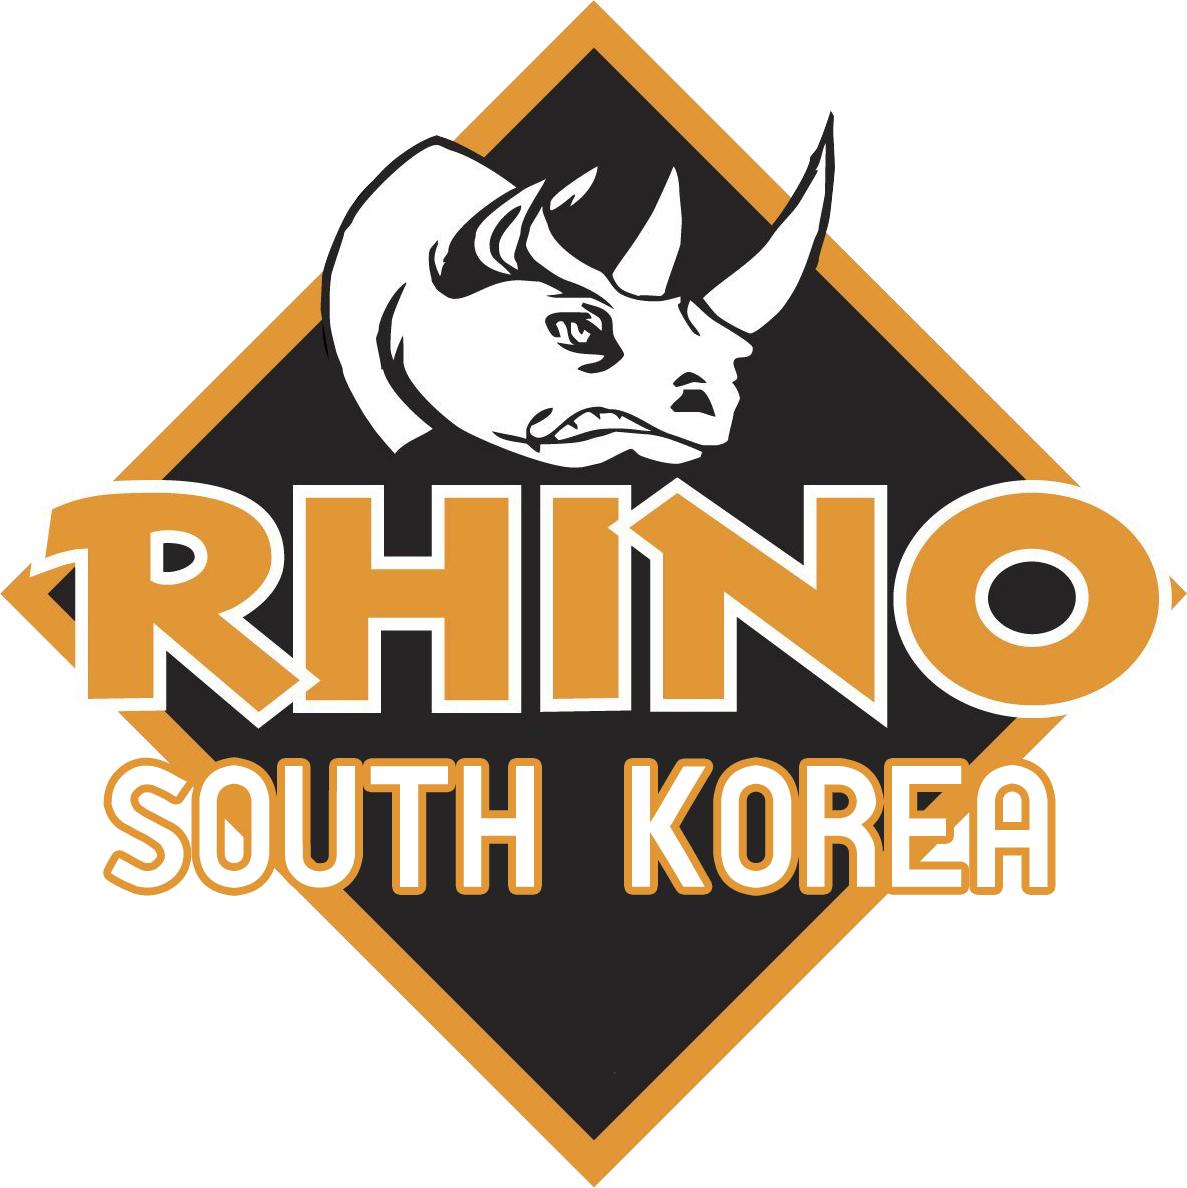 Rhino Trunks South Korea